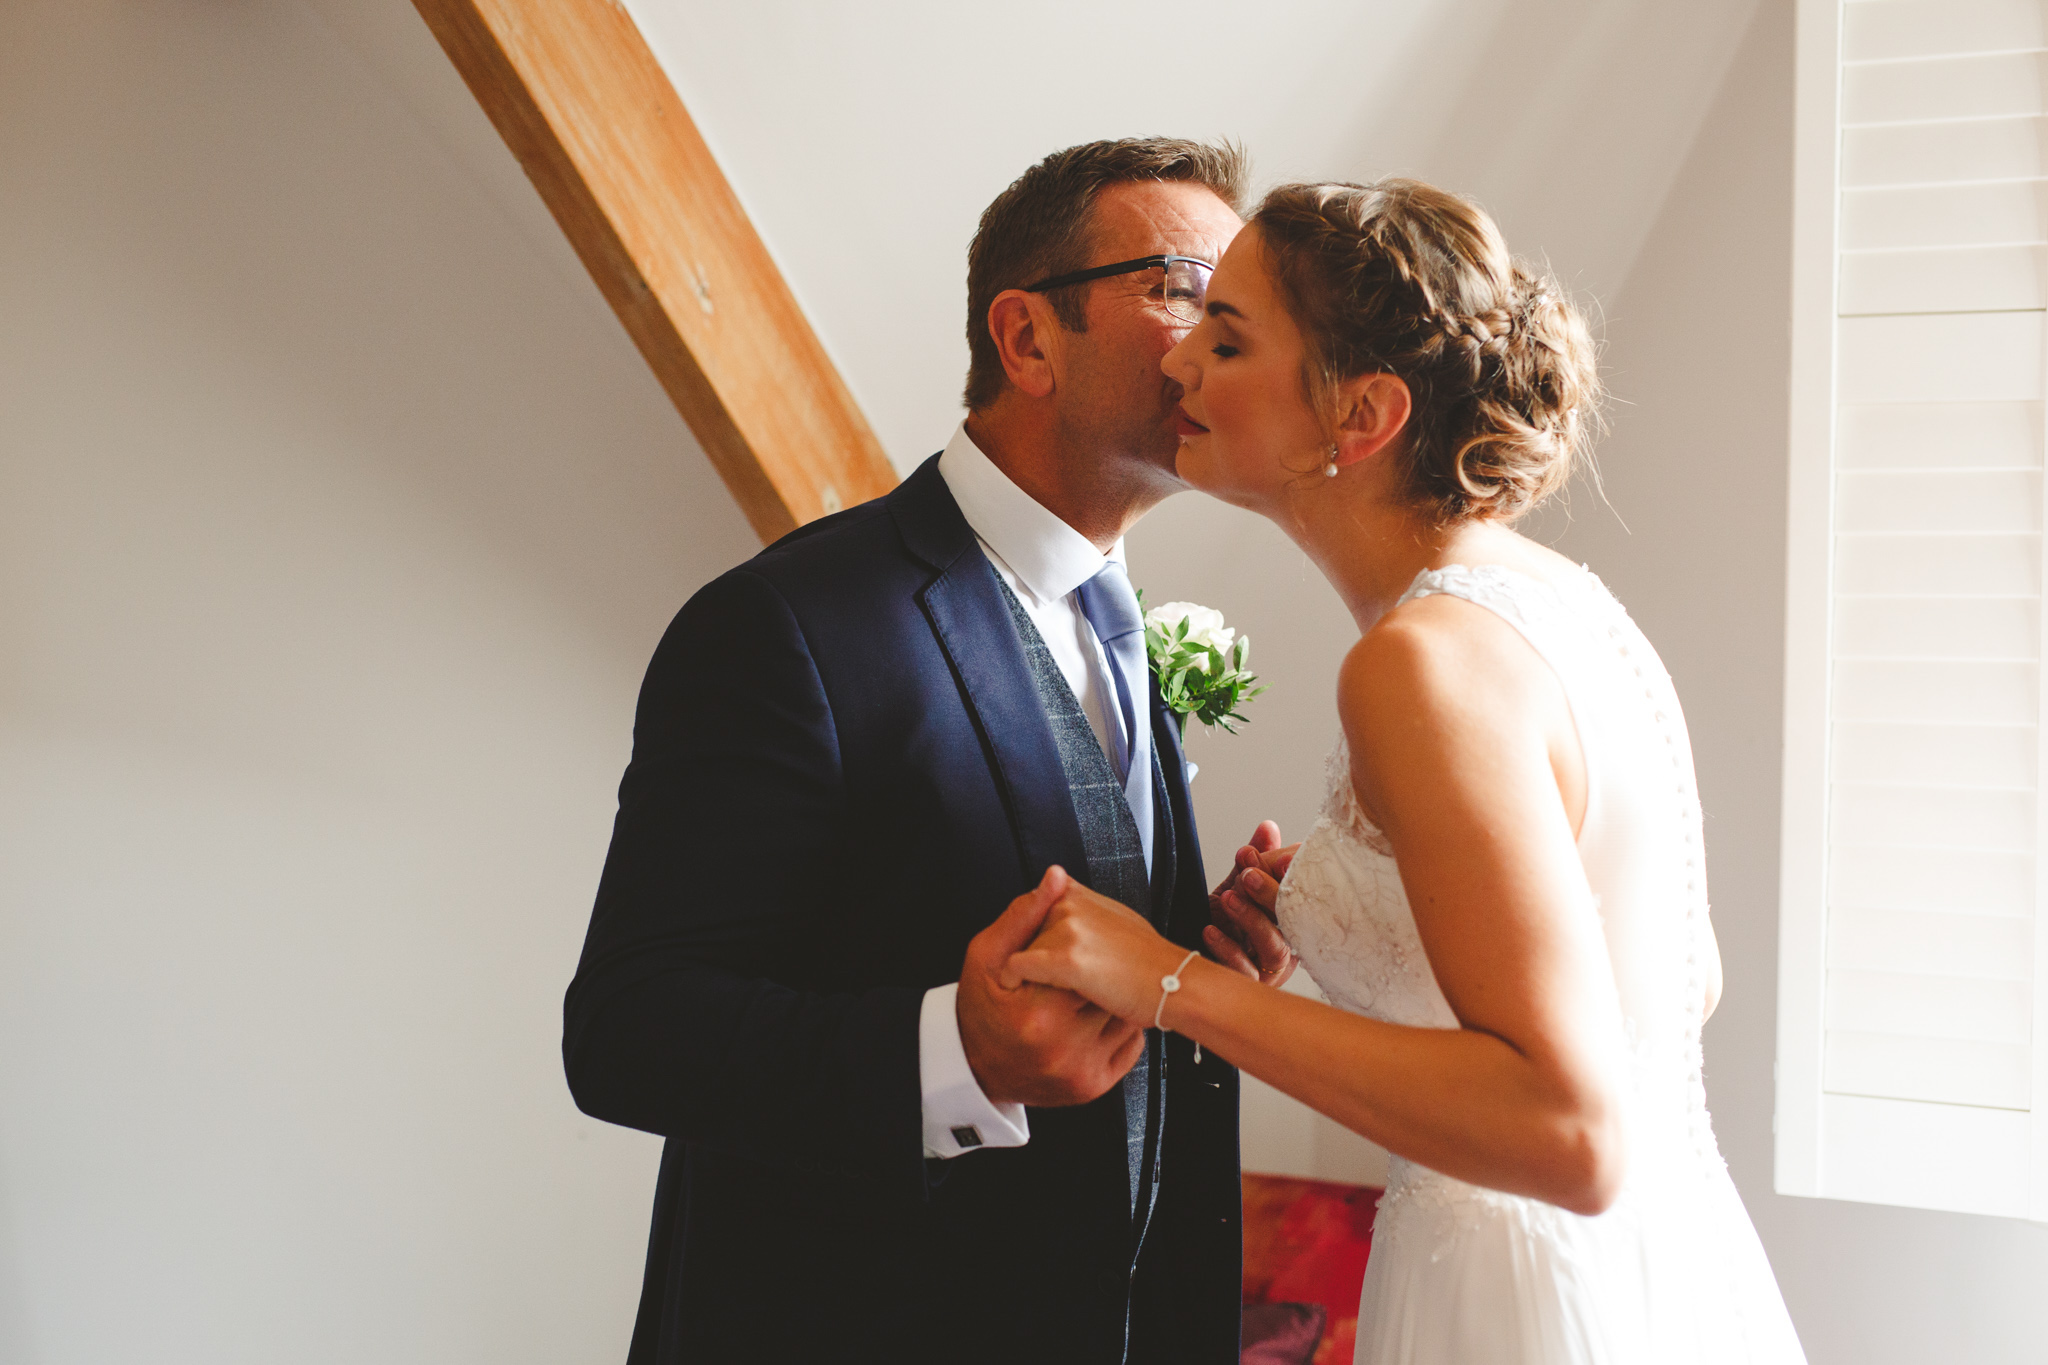 didsbury-house-hotel-wedding-photography--16.jpg